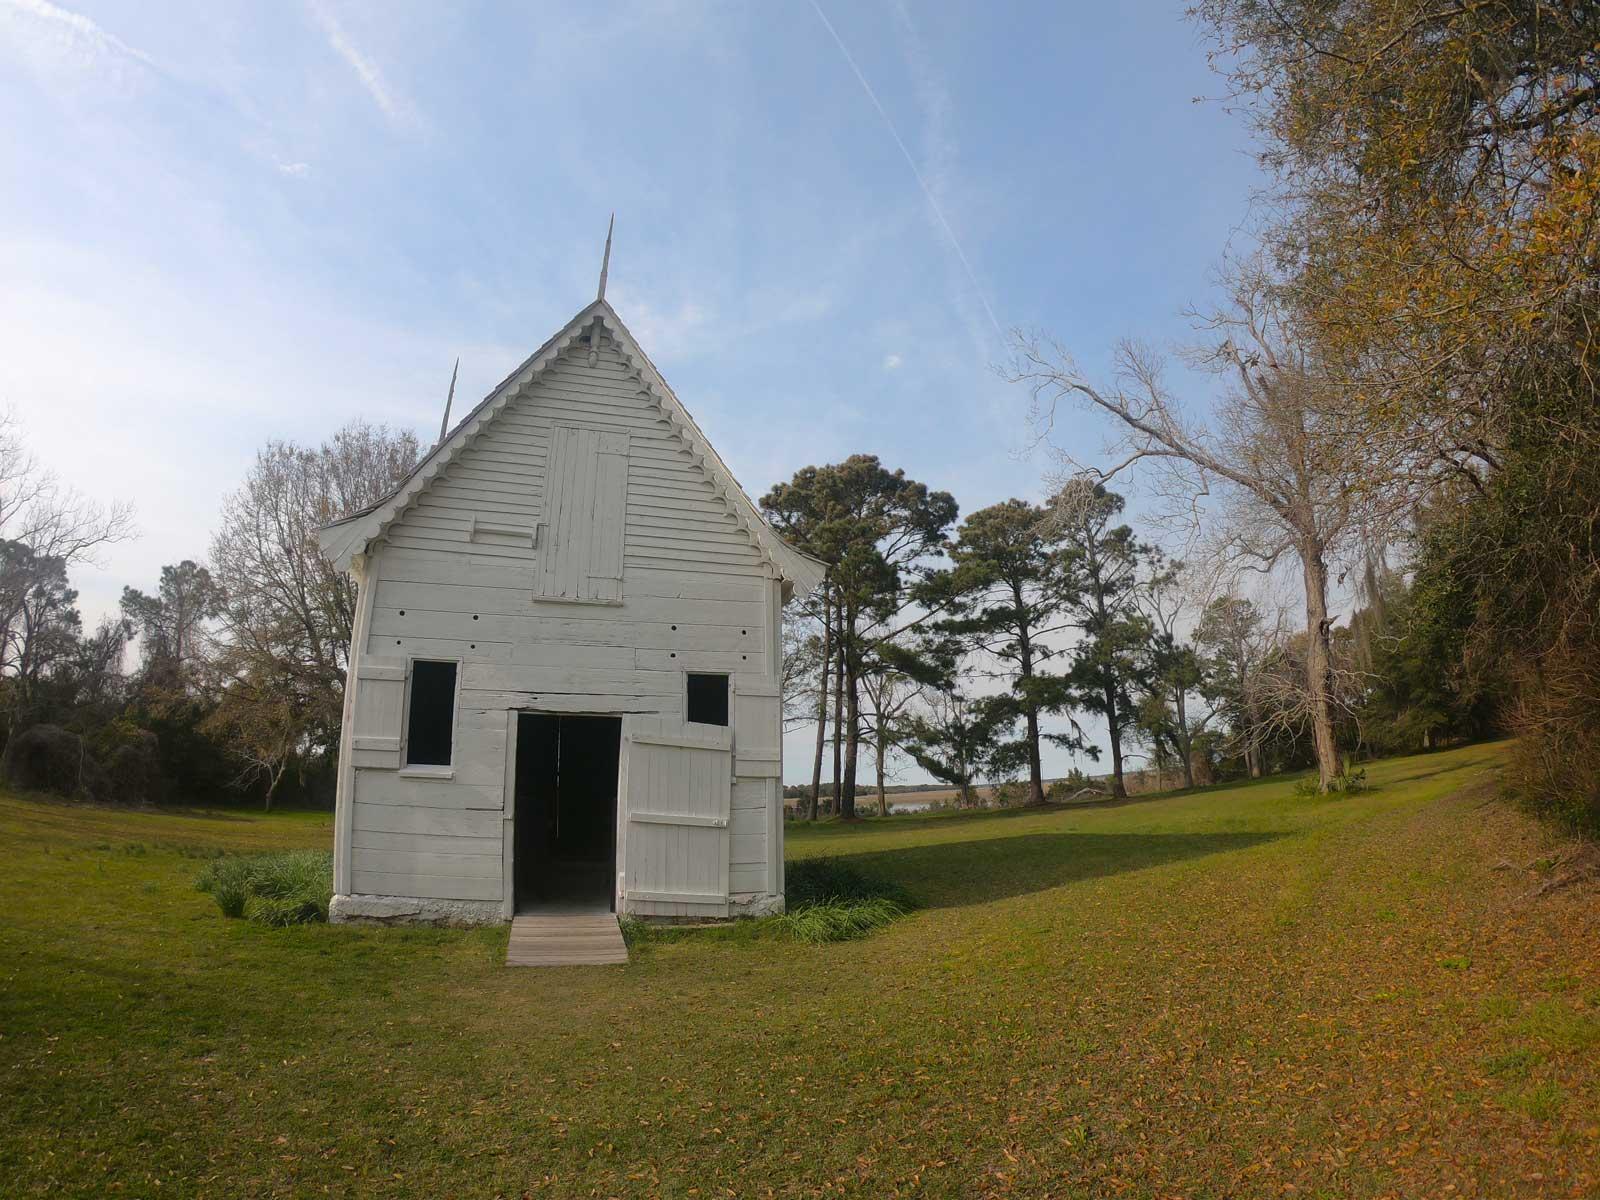 The white ice house, example of Gothic Revival Architecture, at Botany Bay Plantation, Edisto Island, SC